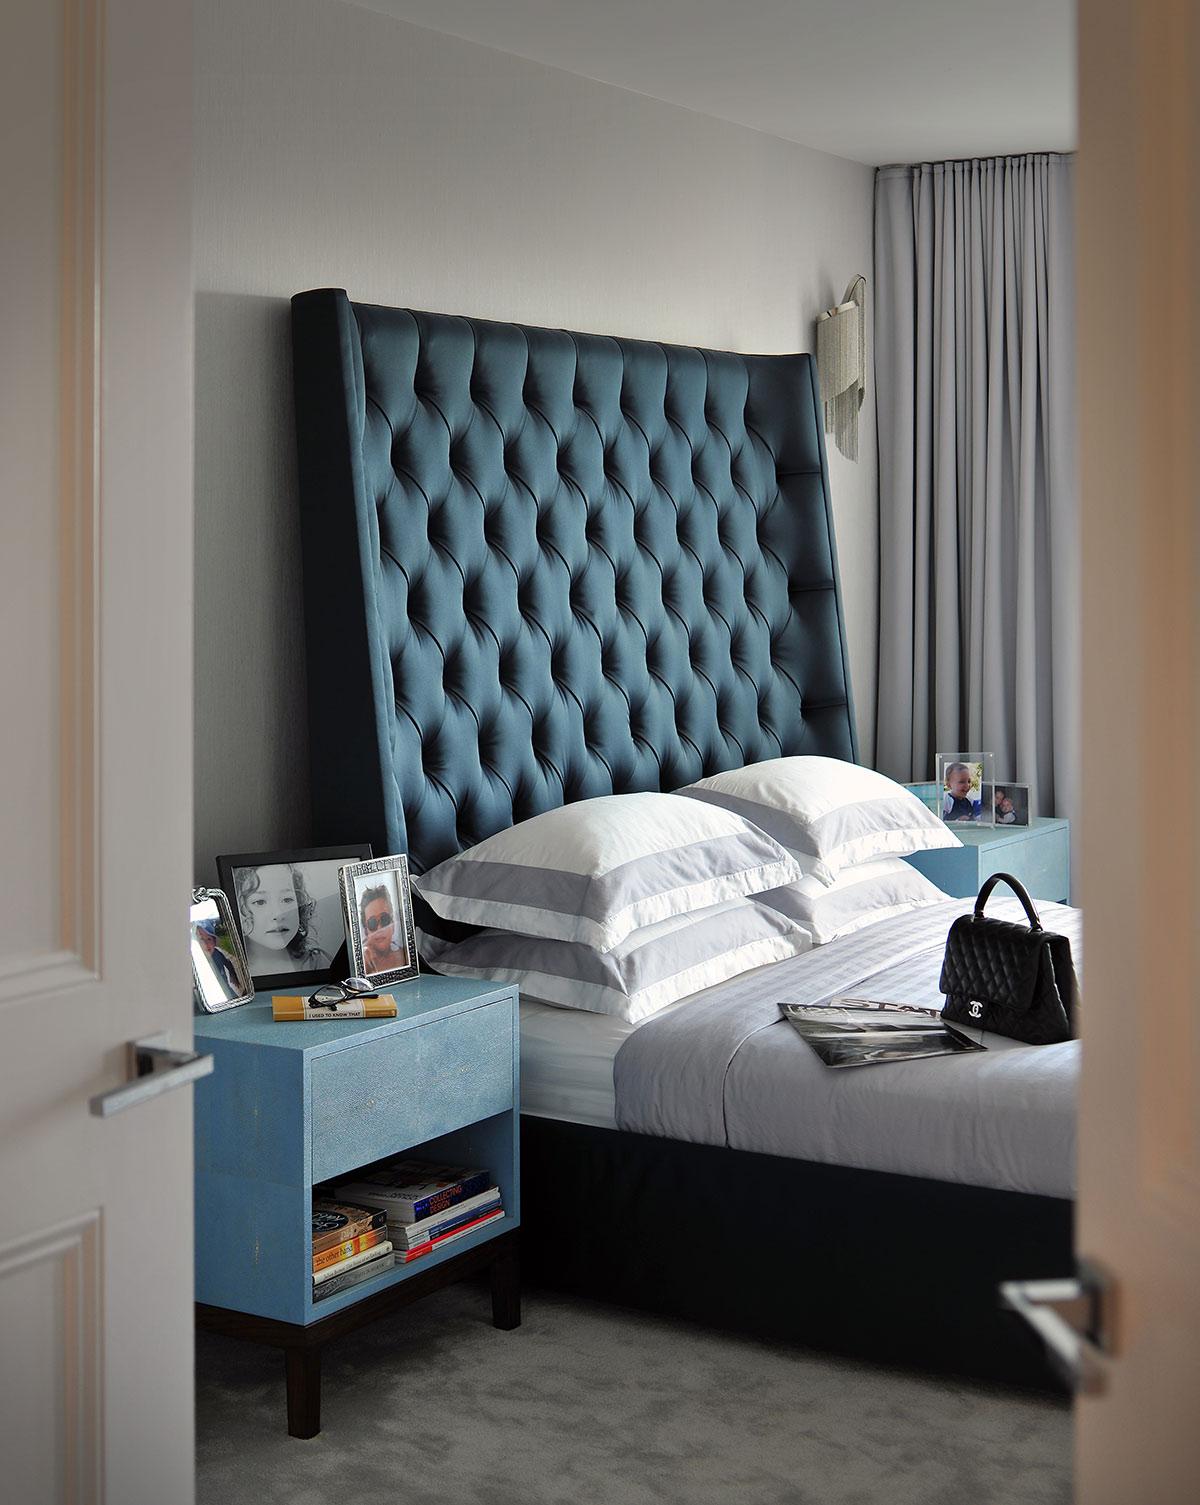 Master bedroom in a luxury designed interior, Hampstead